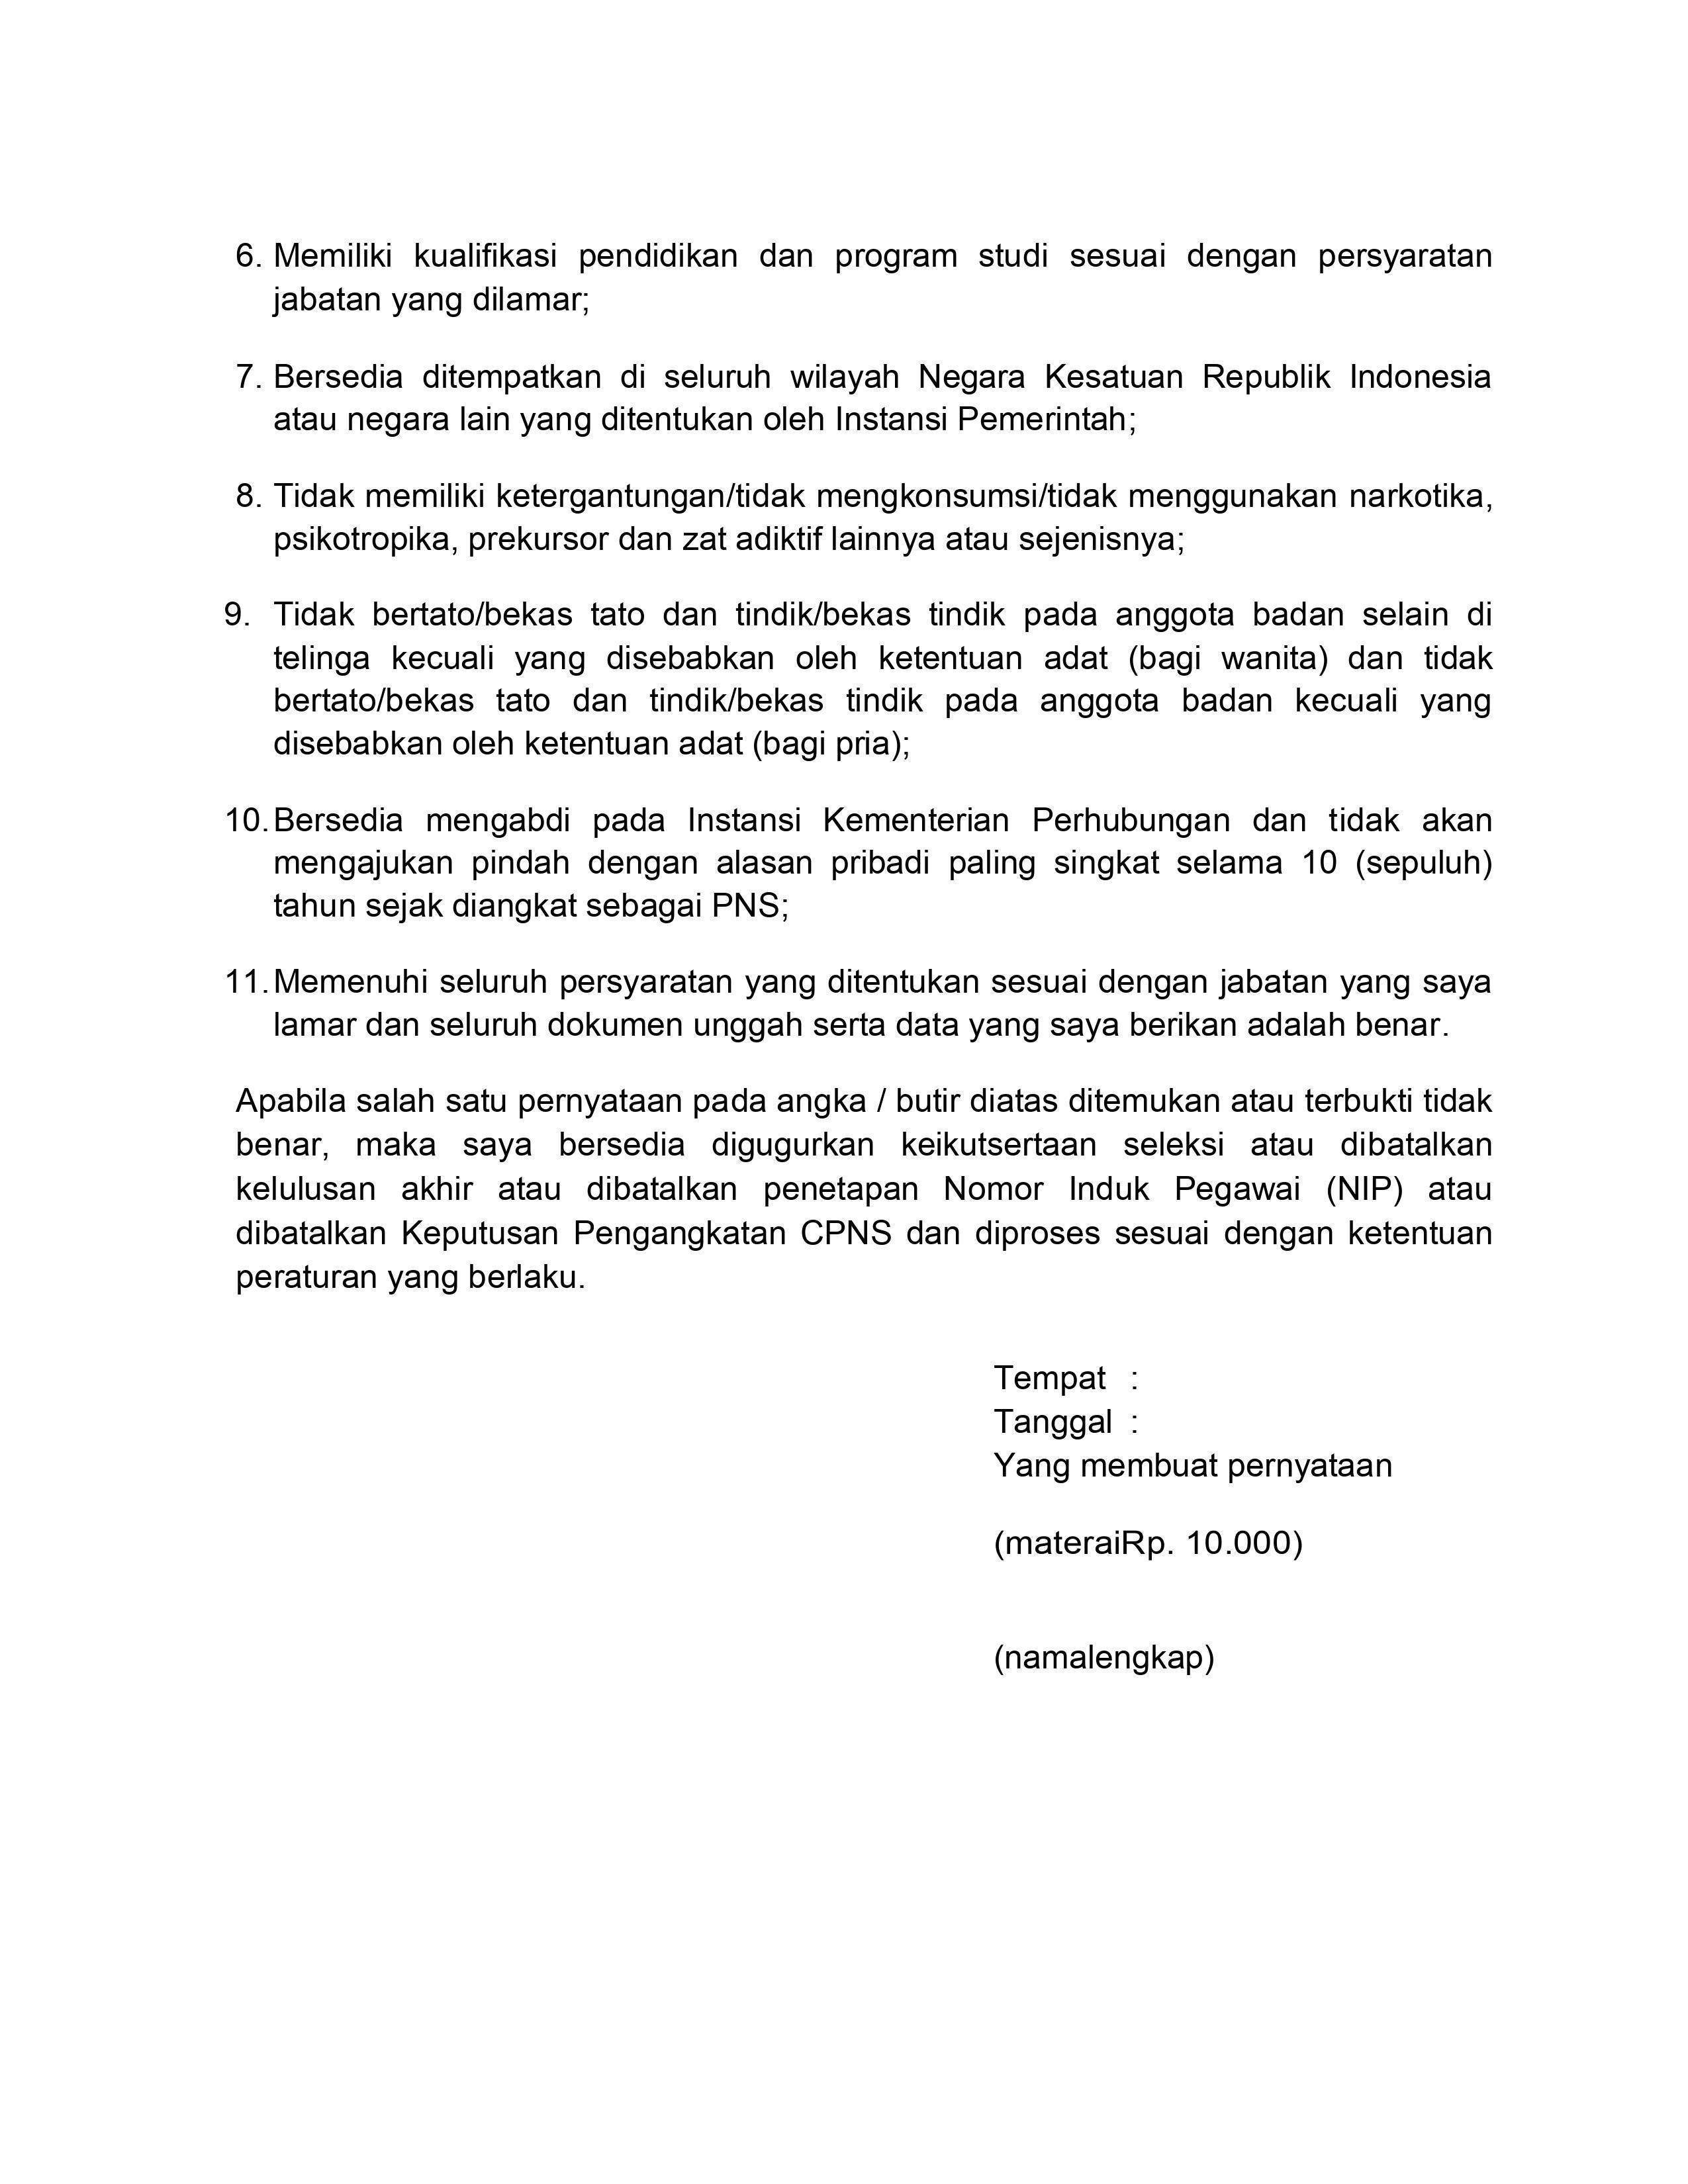 Surat Pernyataan CPNS Kemenhub halaman 2